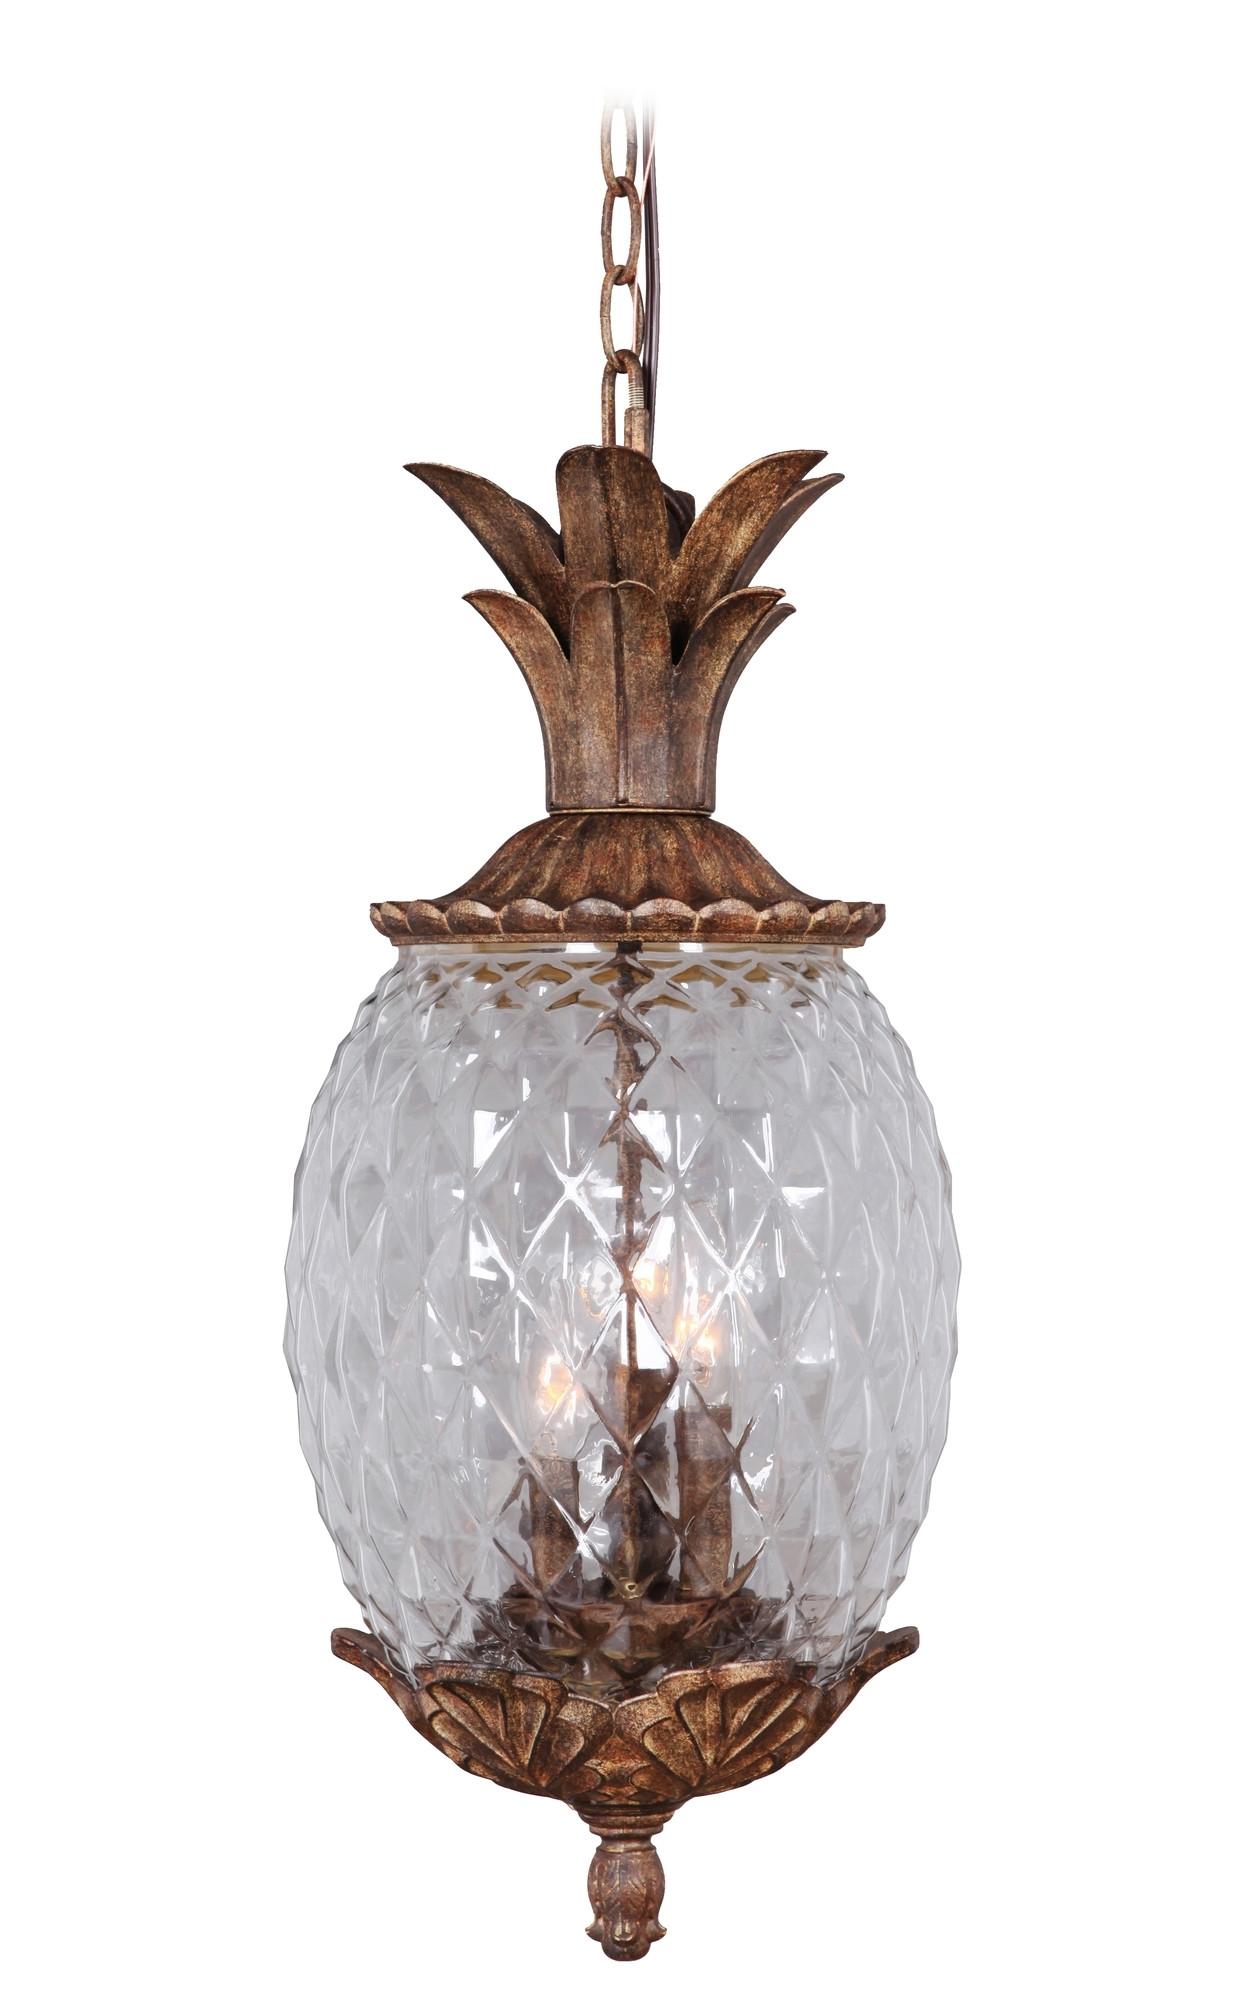 Marianahome Pineapple 3 Light Pendant & Reviews | Wayfair | Lighting In Outdoor Lighting Fixtures At Wayfair (View 9 of 15)